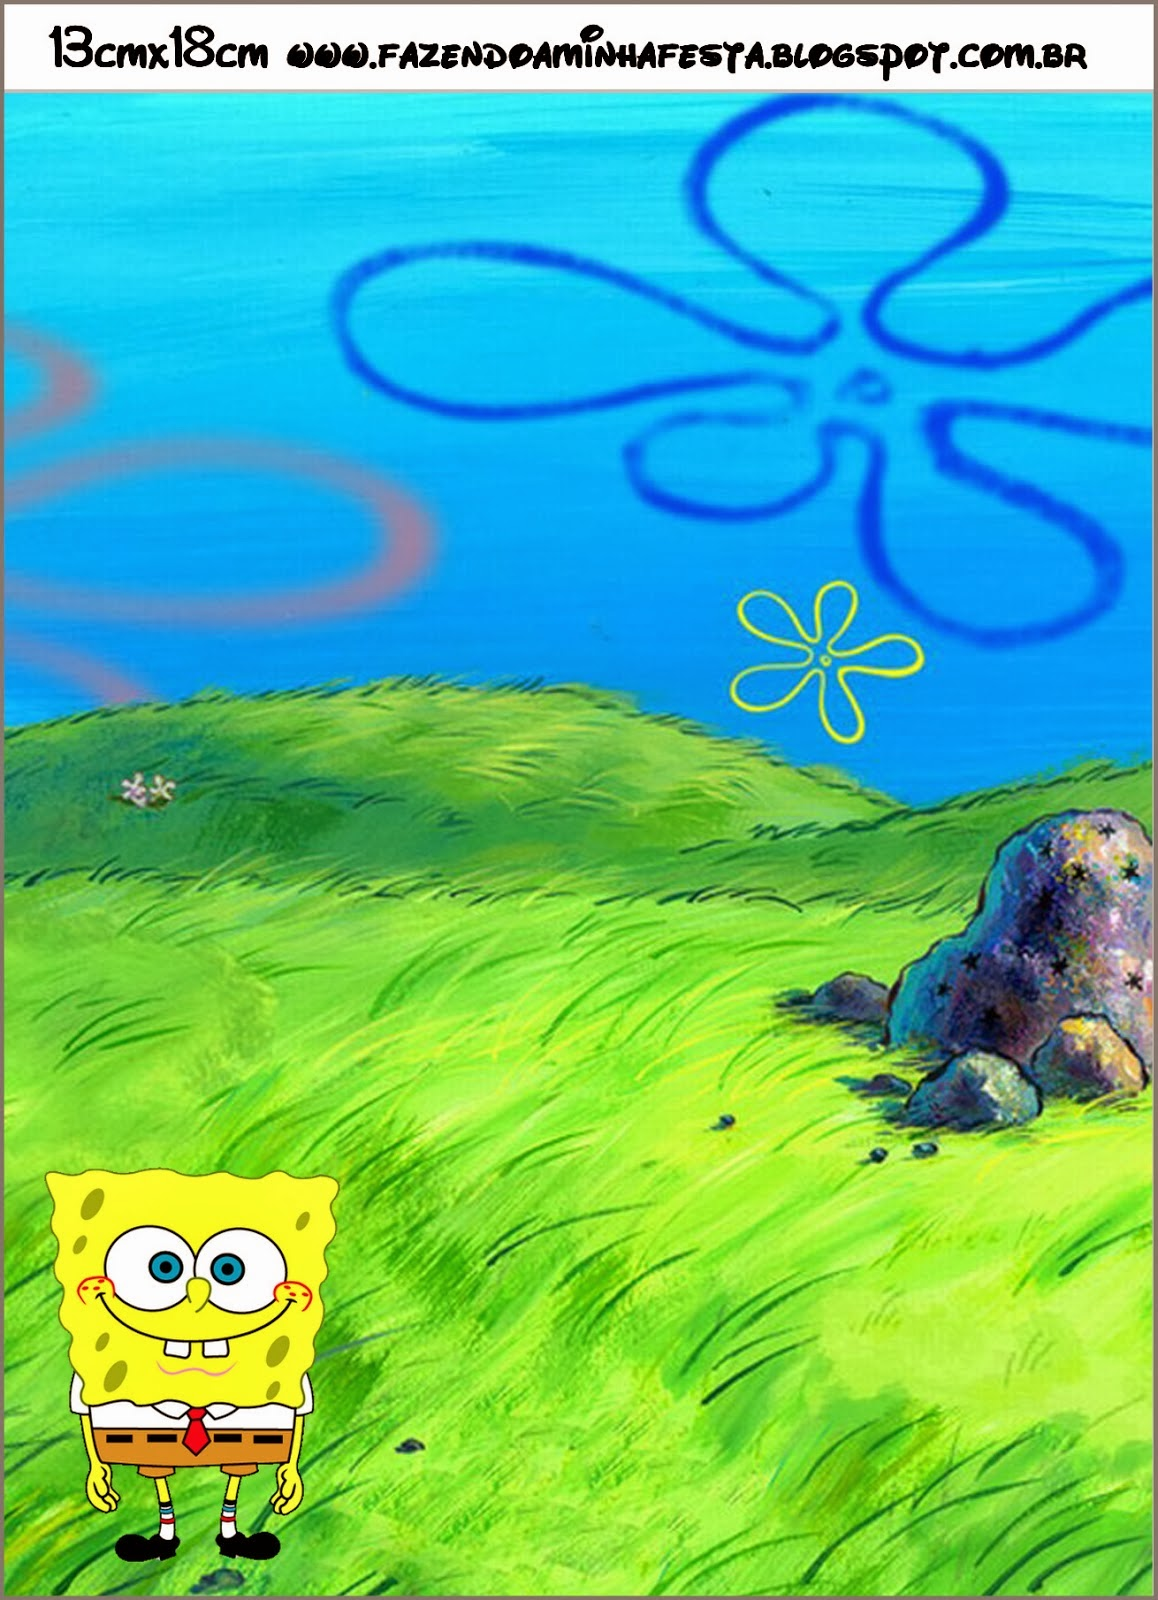 Spongebob Squarepants Free Printable Cards And Invitations Oh My